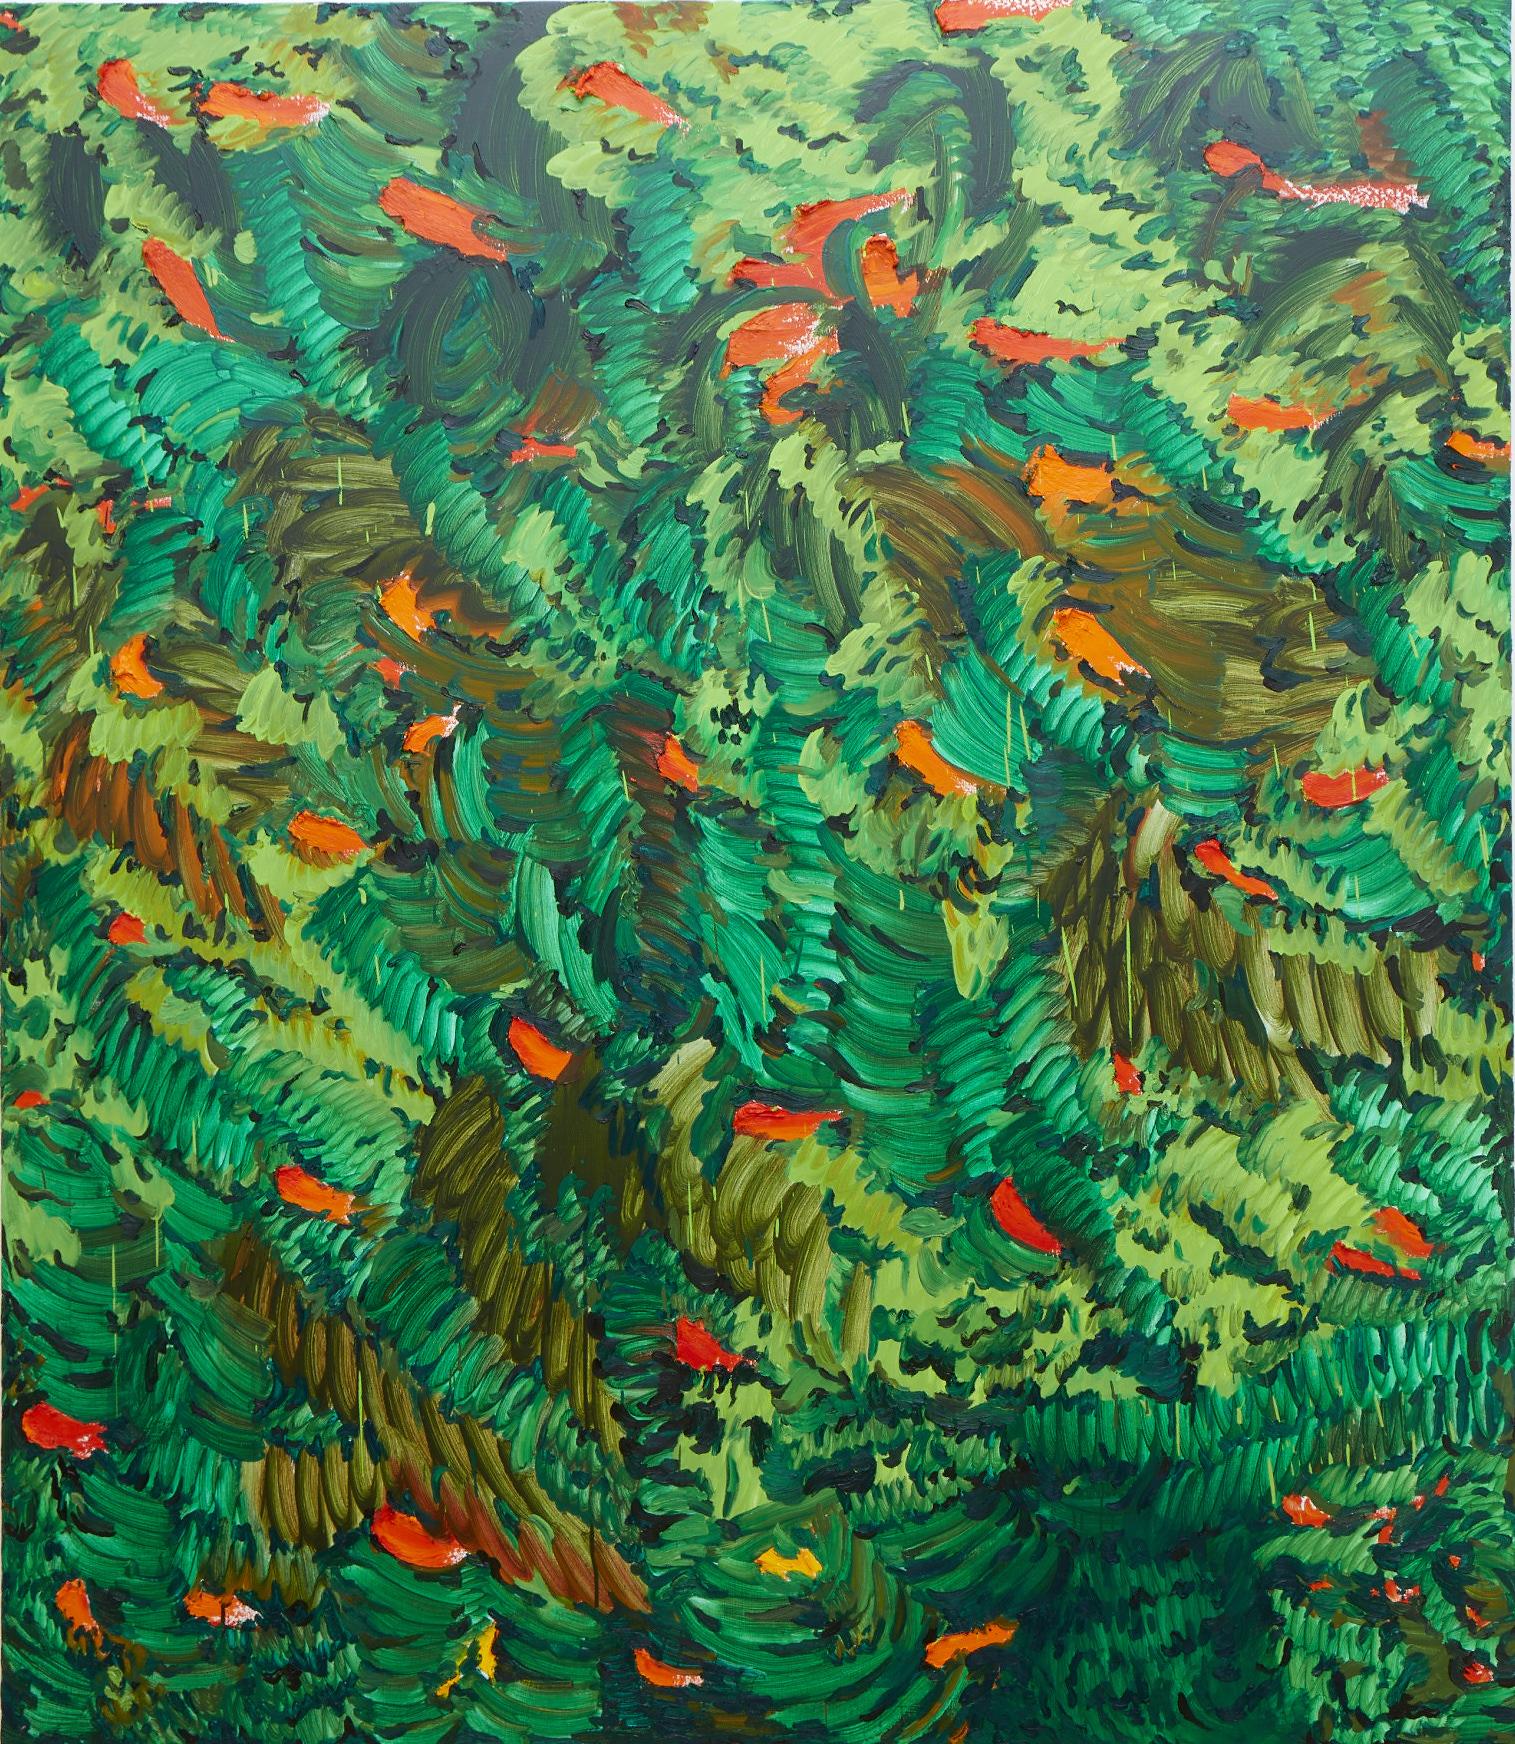 02_MK_Between Jungles_180 x 210cm_oil on canvas_2016.jpg